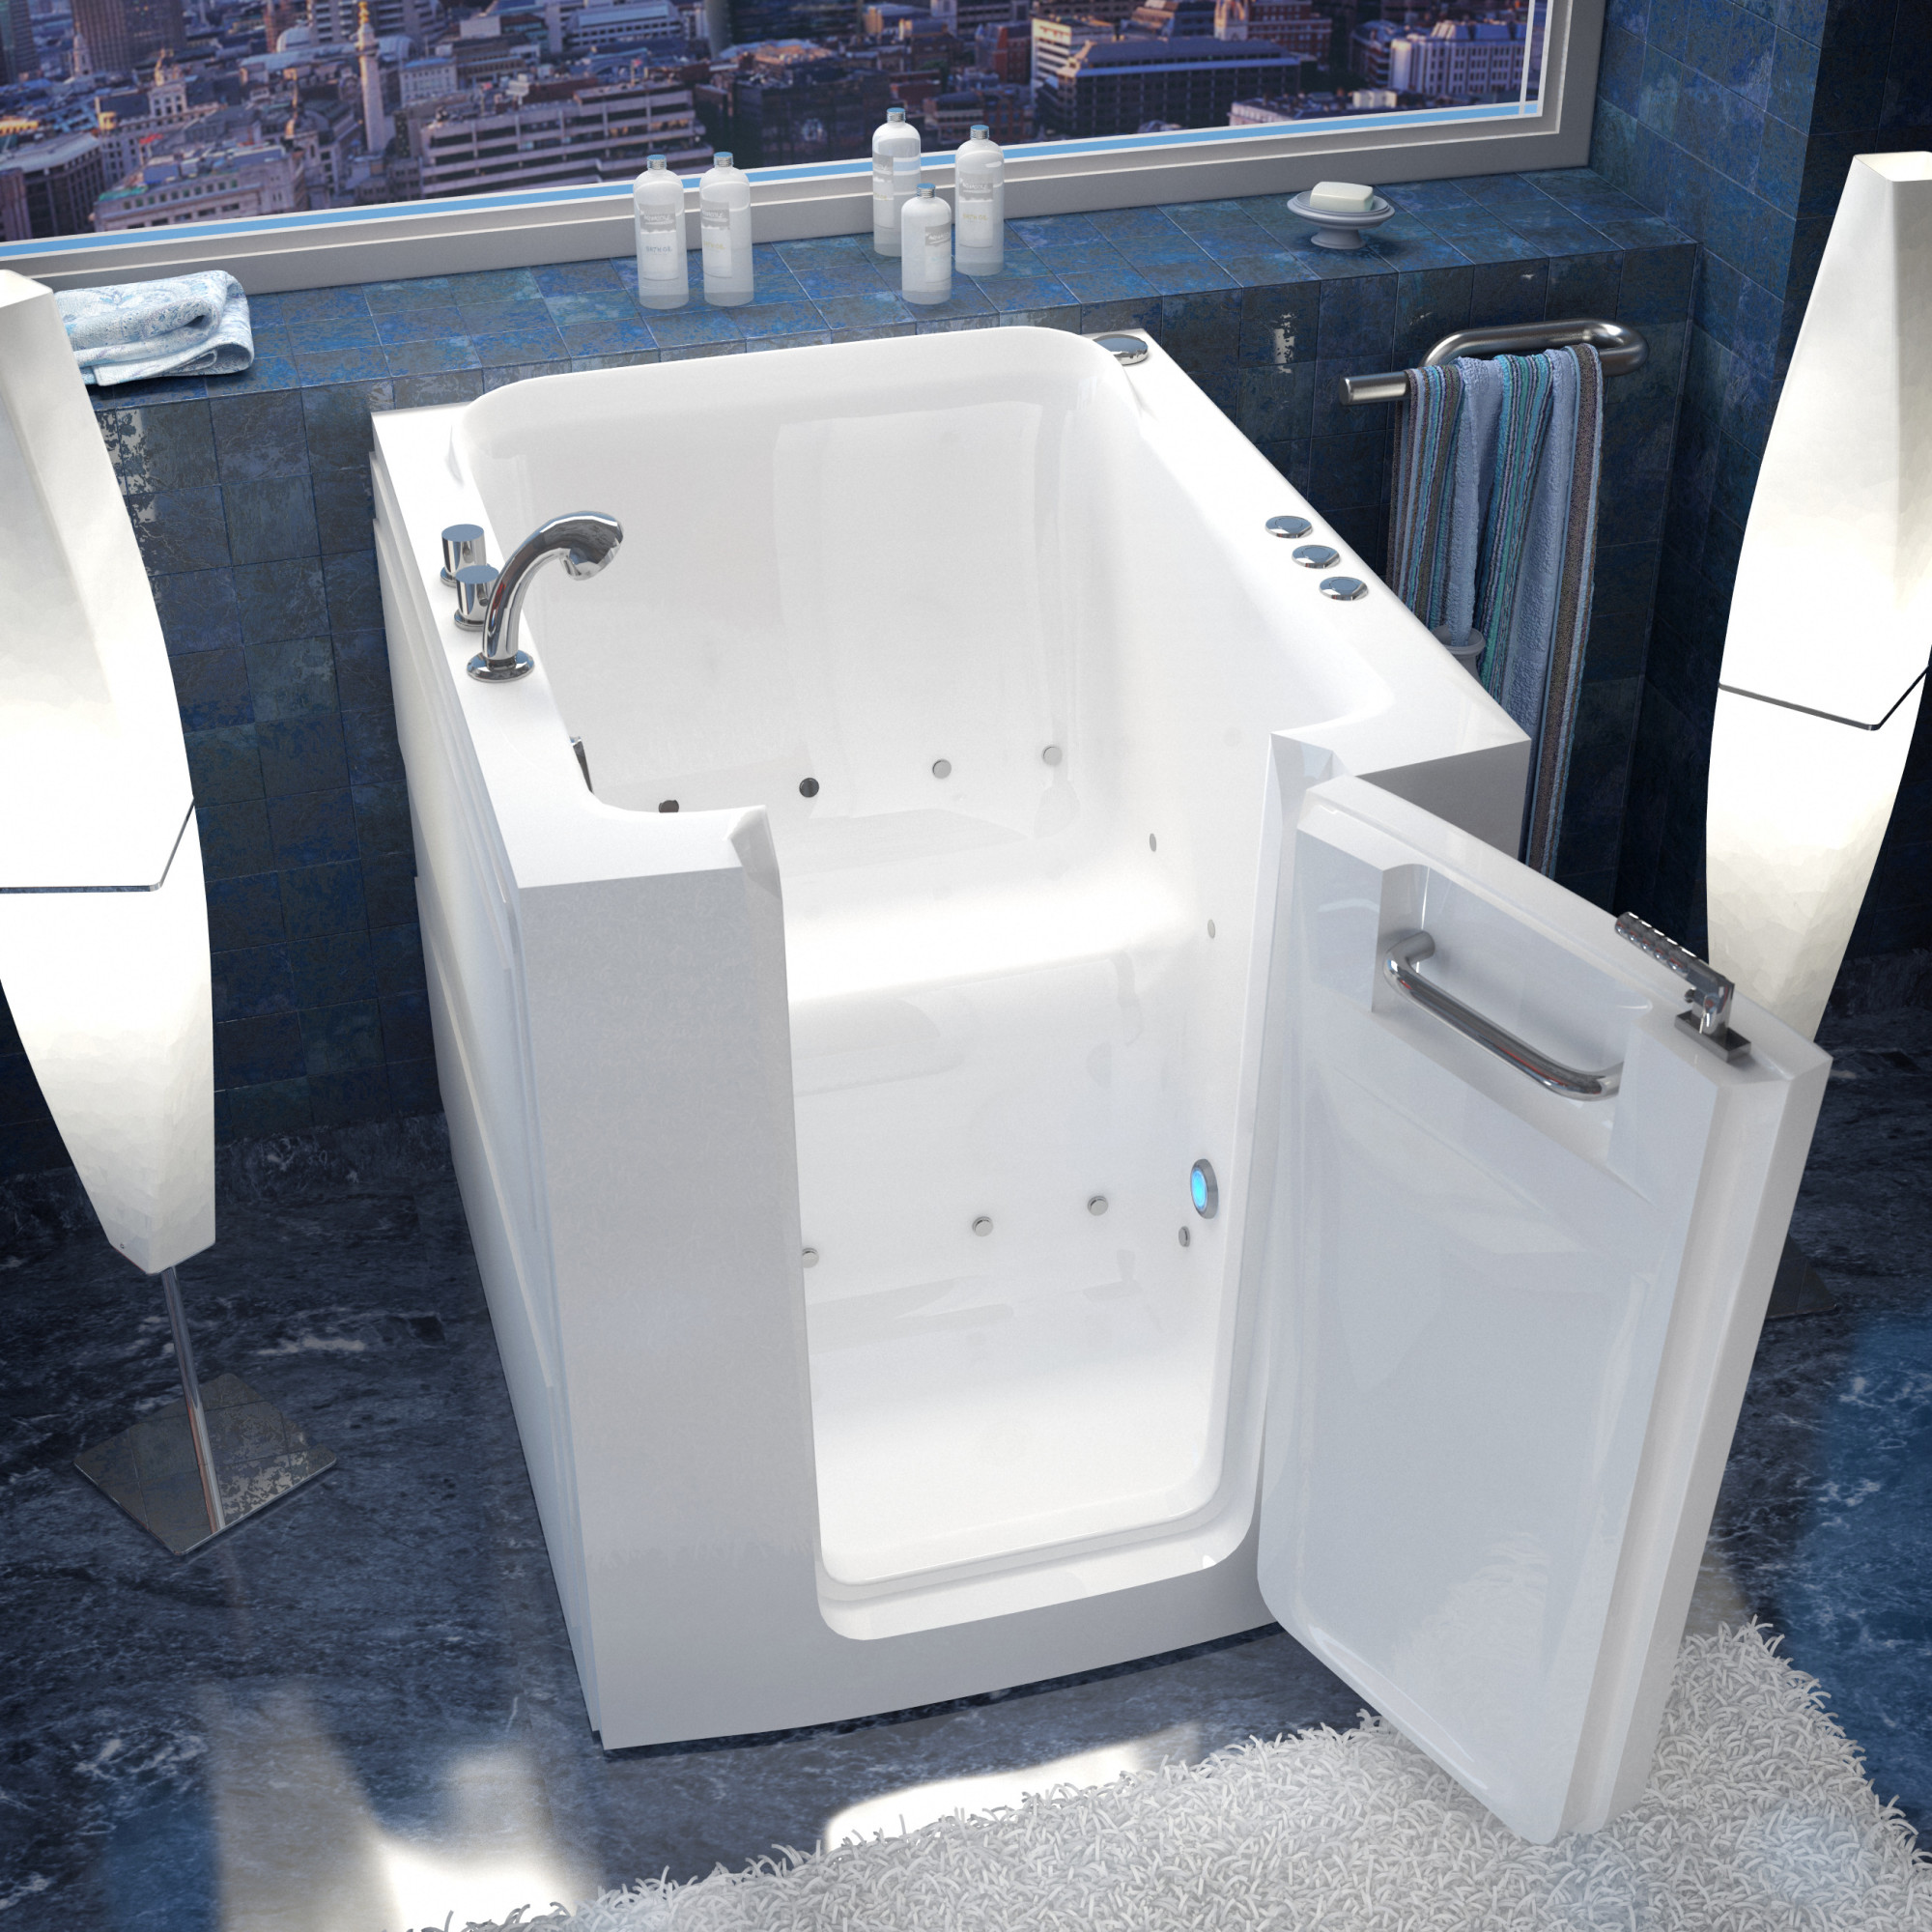 "Avano AV3238RA Walk-In Tubs 37.25"" Acrylic Air Bathtub for Alcove Installations with Right Drain, Roman Tub Faucet & Handshower"